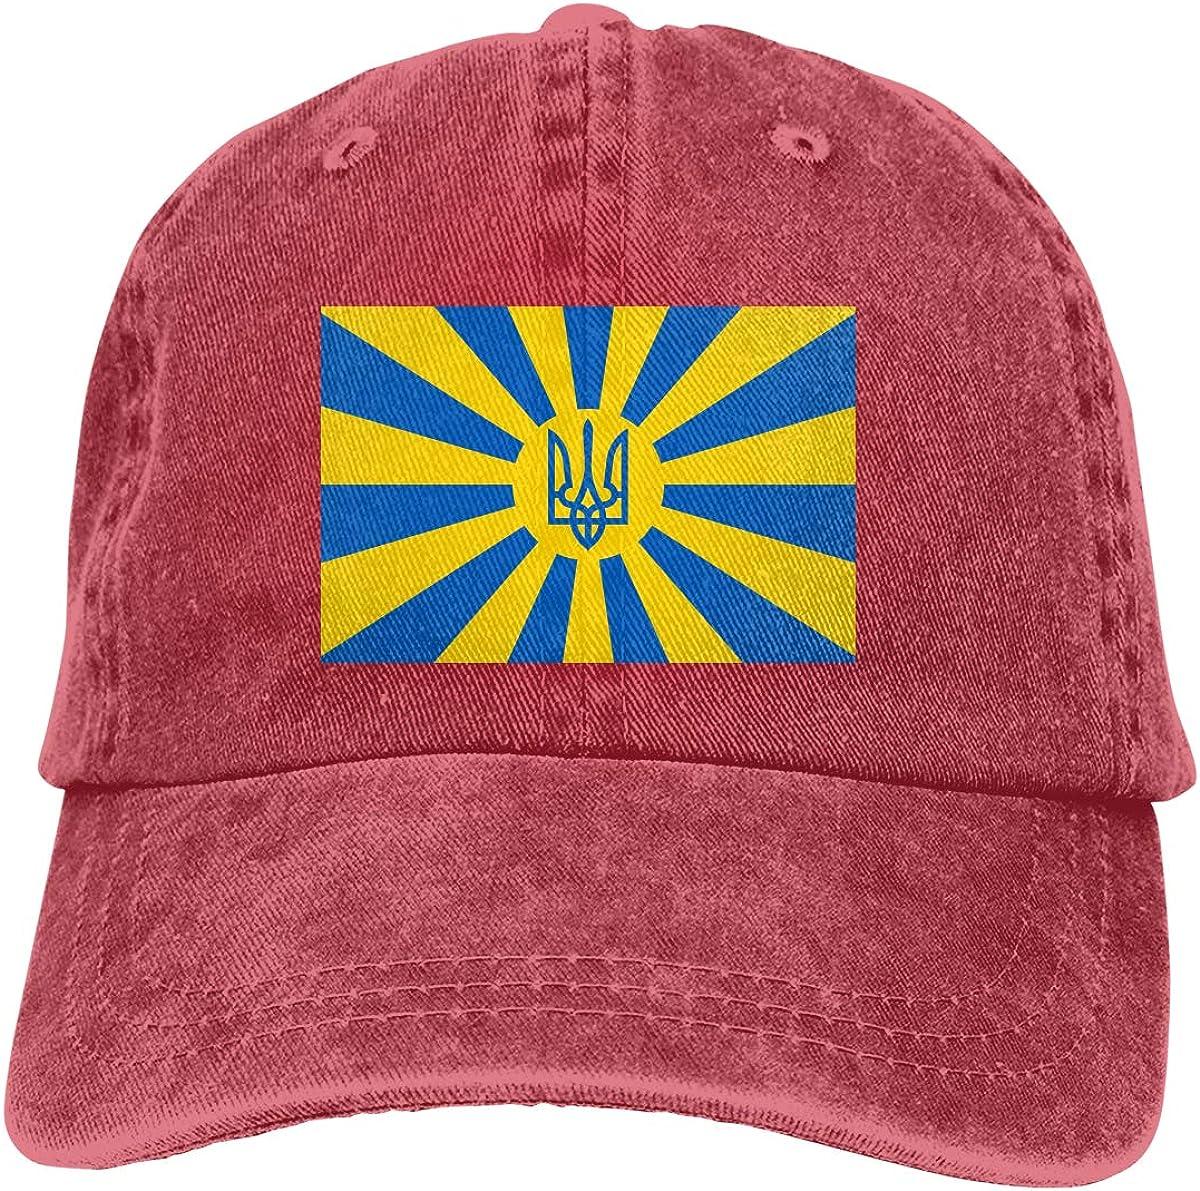 Cotton Hats Amayc Adjustable Mens Denim Baseball Caps Ukrainian Funny